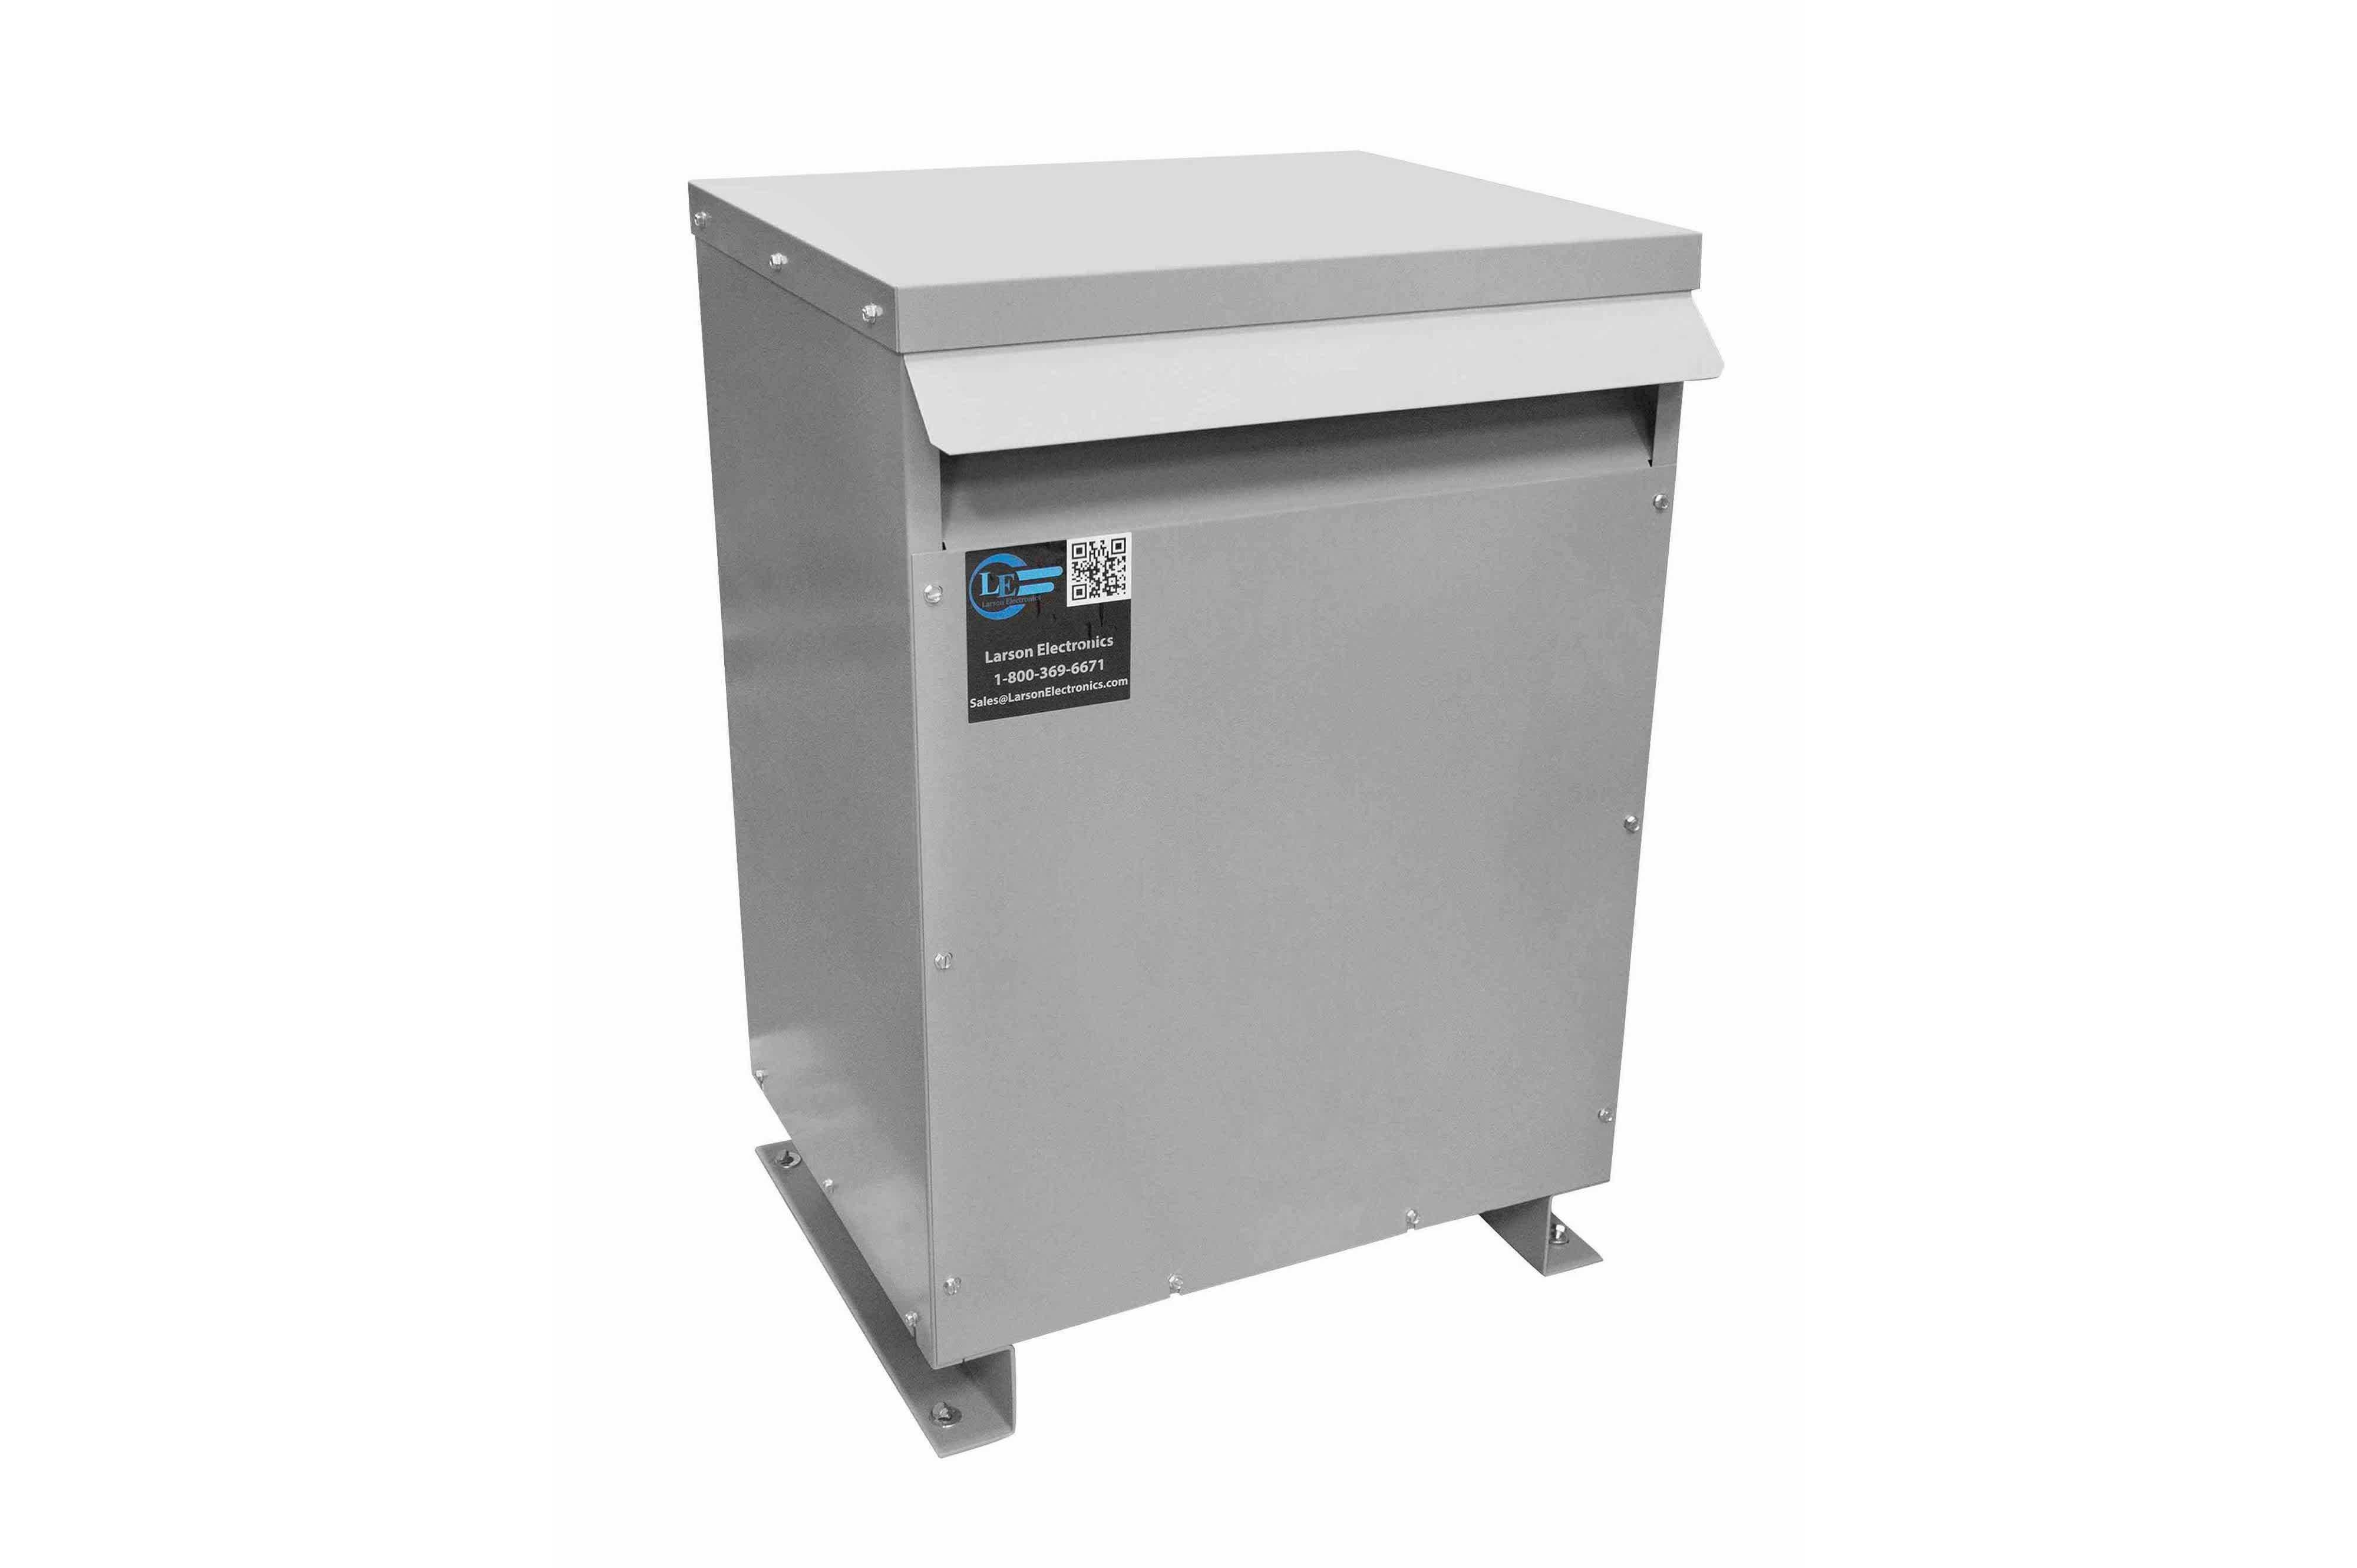 115 kVA 3PH Isolation Transformer, 460V Wye Primary, 575Y/332 Wye-N Secondary, N3R, Ventilated, 60 Hz